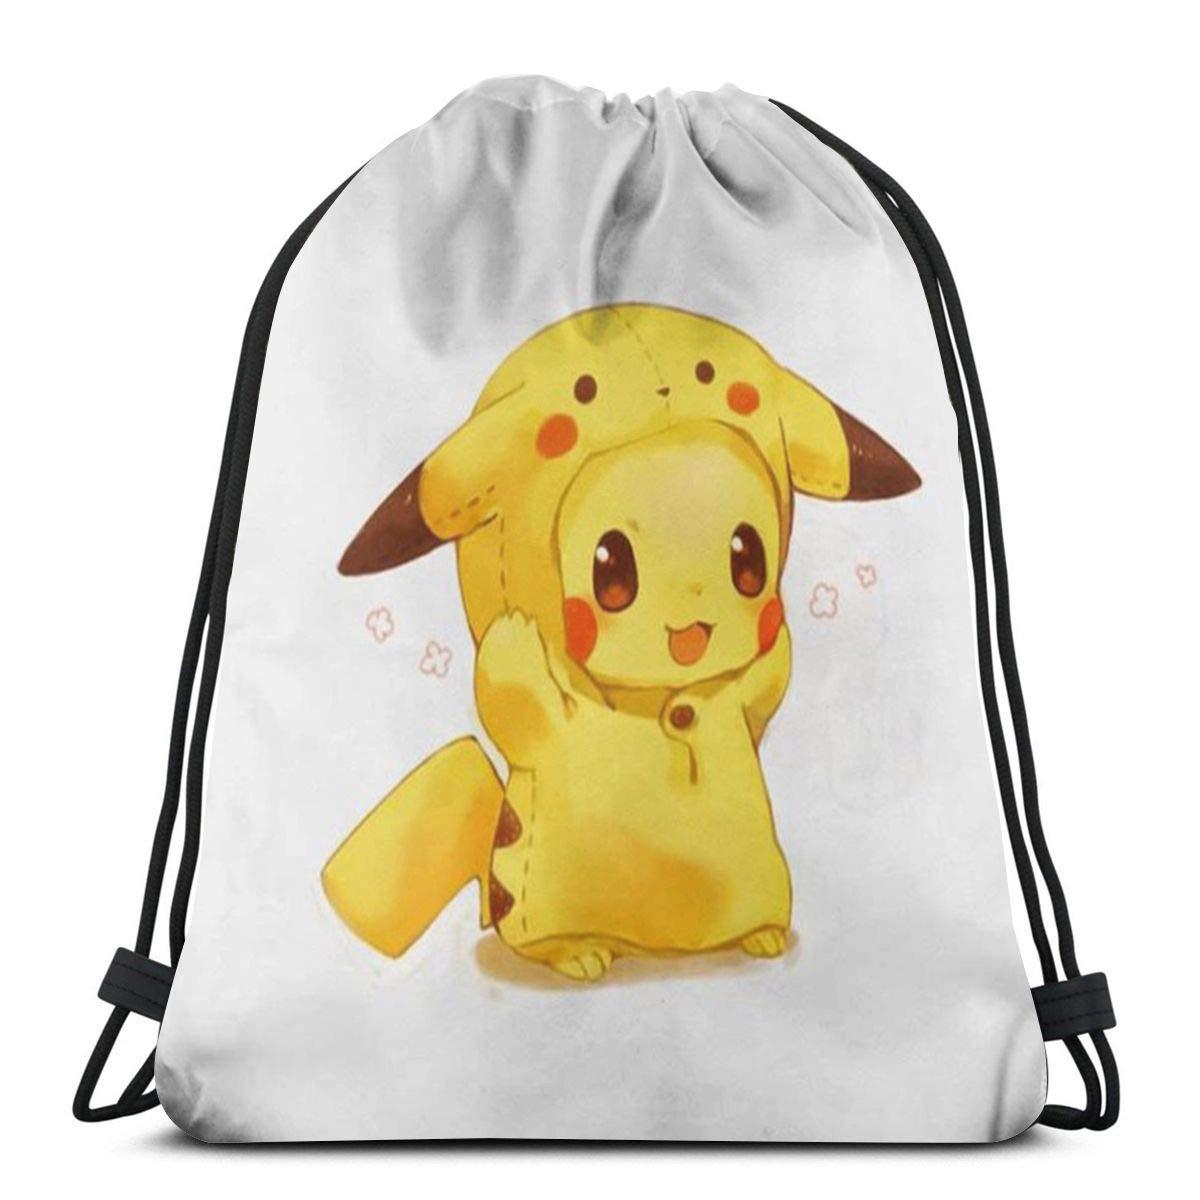 c8ee8fa77b Classic drawstring bag cute cartoon pikachu backpack shoulder bags sport  storage bag for man women home. Download Image